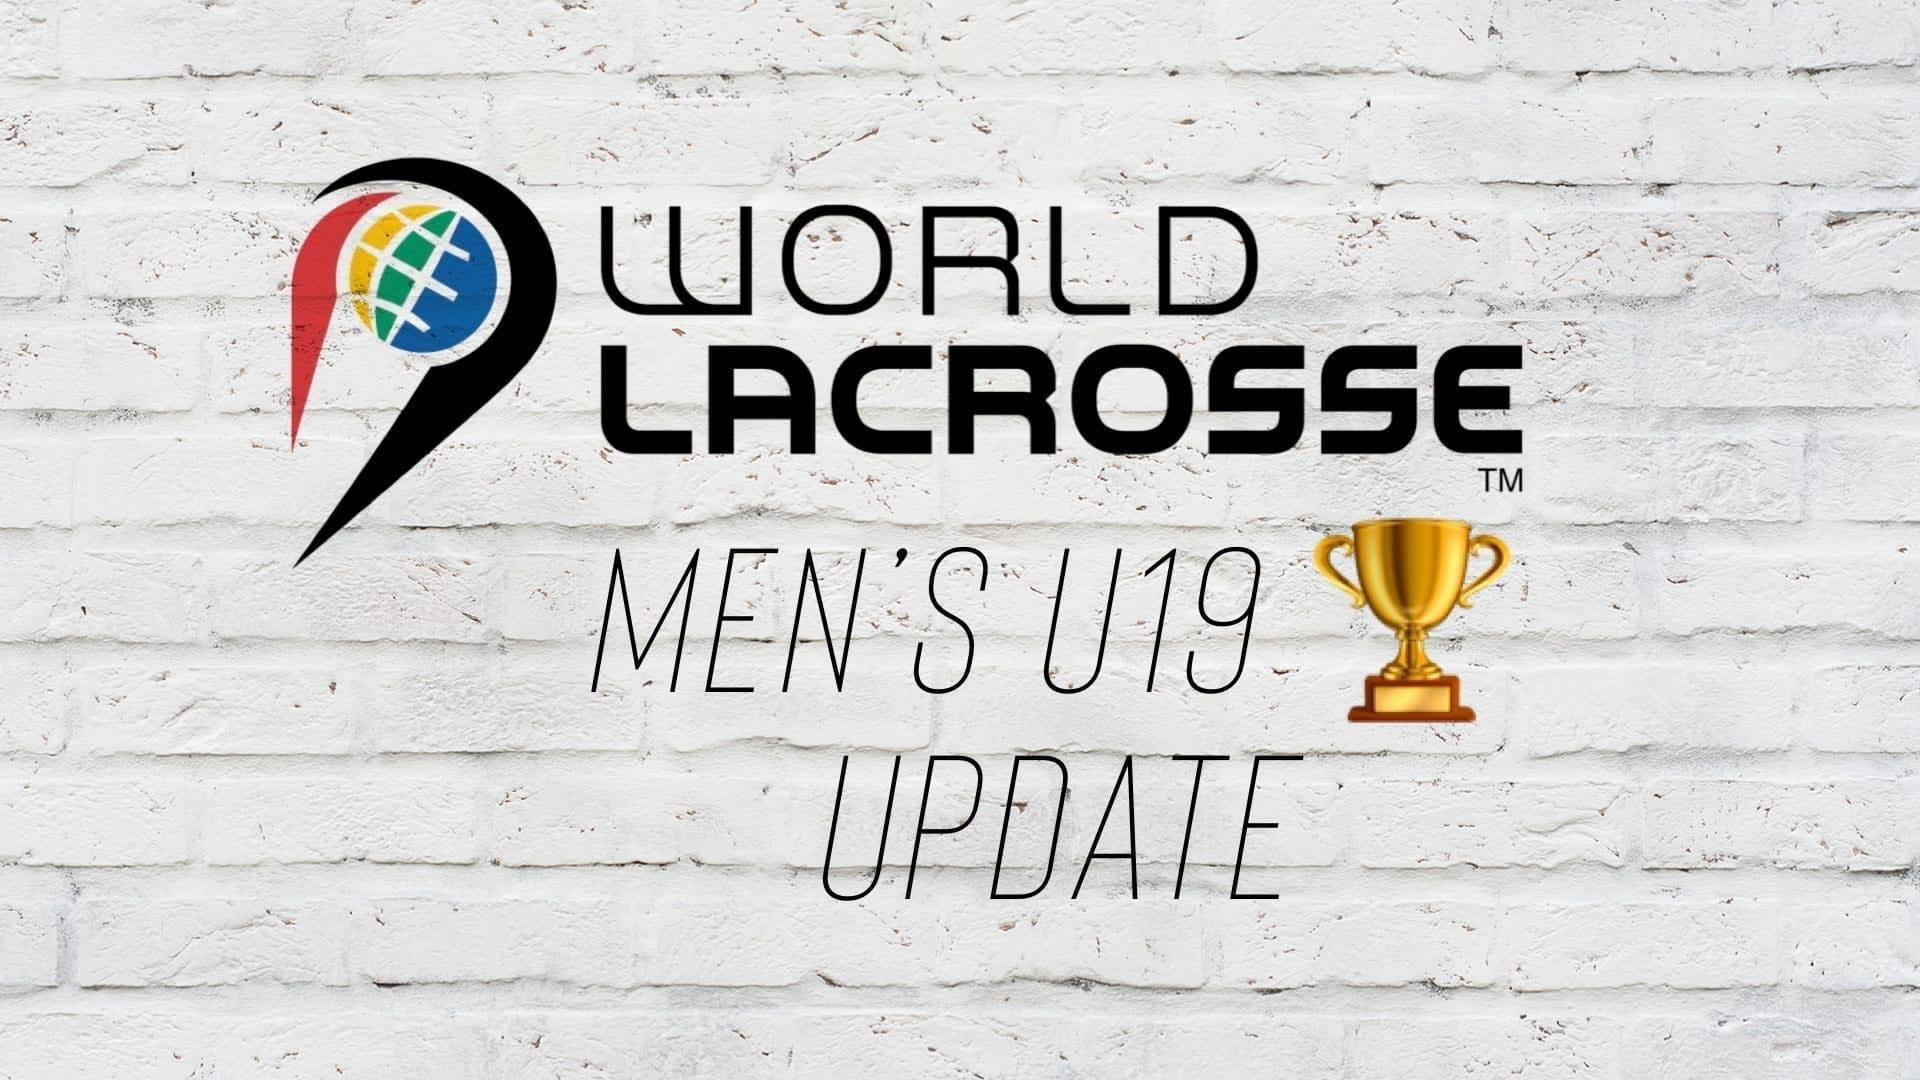 men's u19 world championship lacrosse